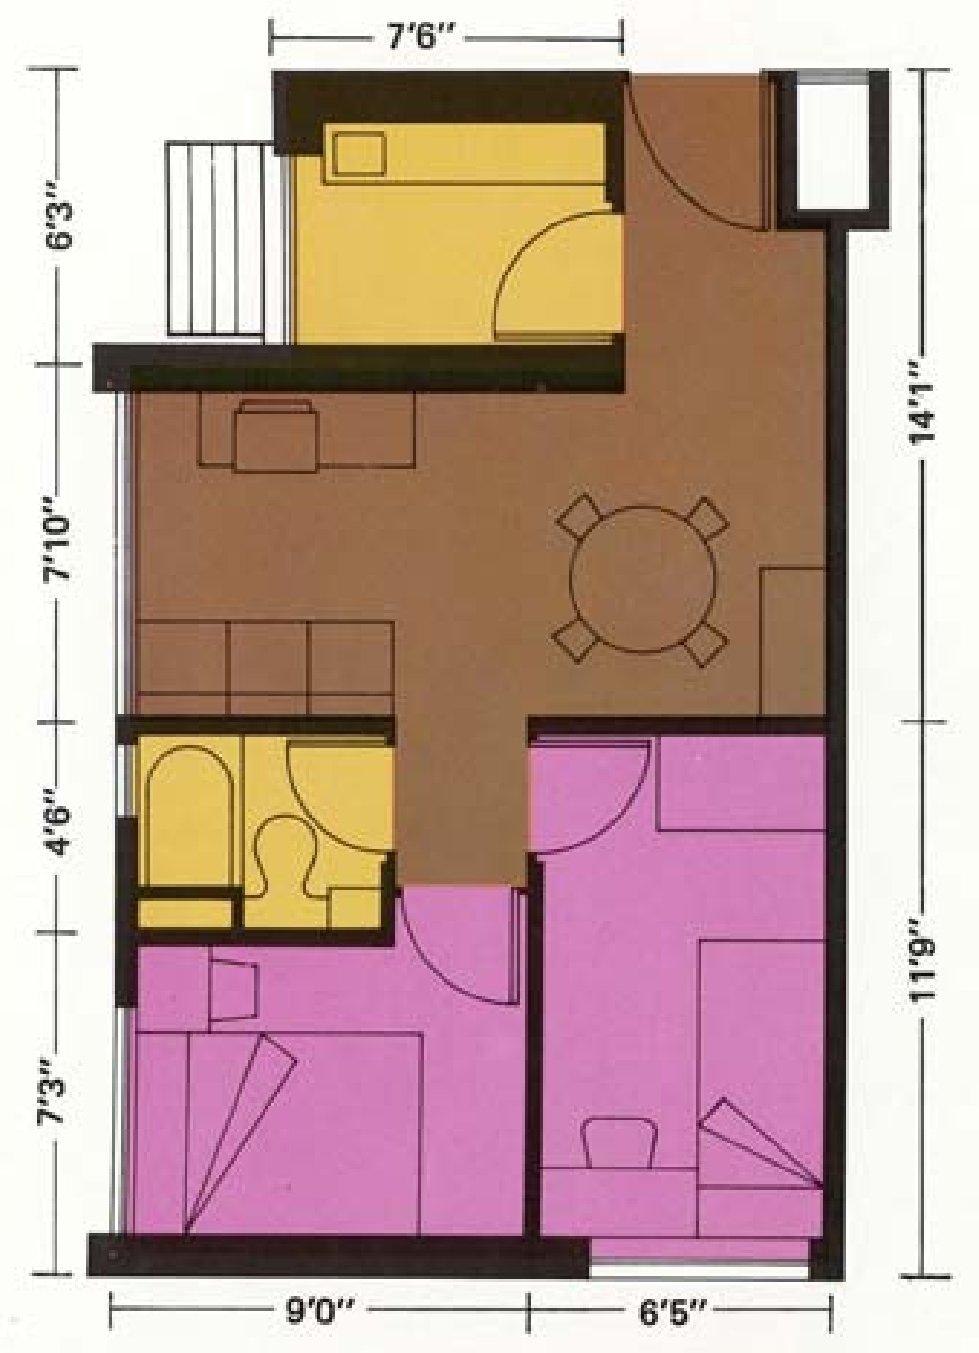 bid_deco_floorplan_1503484980.jpg